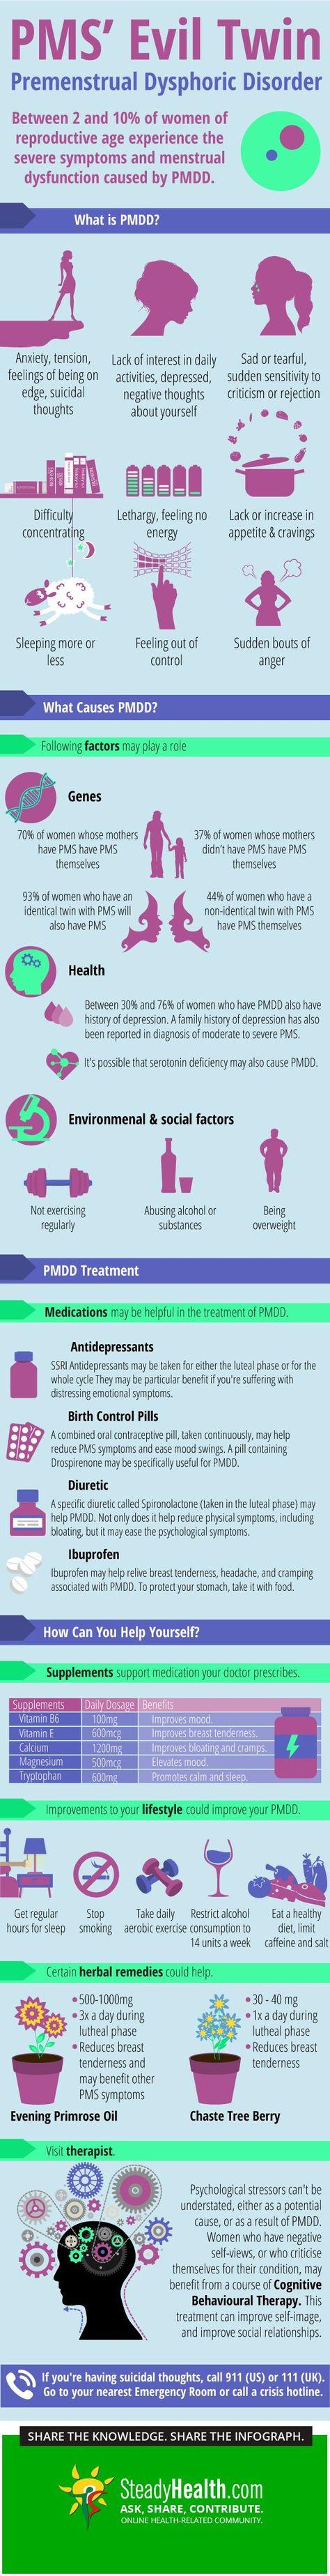 Premenstrual Dysphoric Disorder: PMS' Evil Twin | Women's Health articles | Family Health center